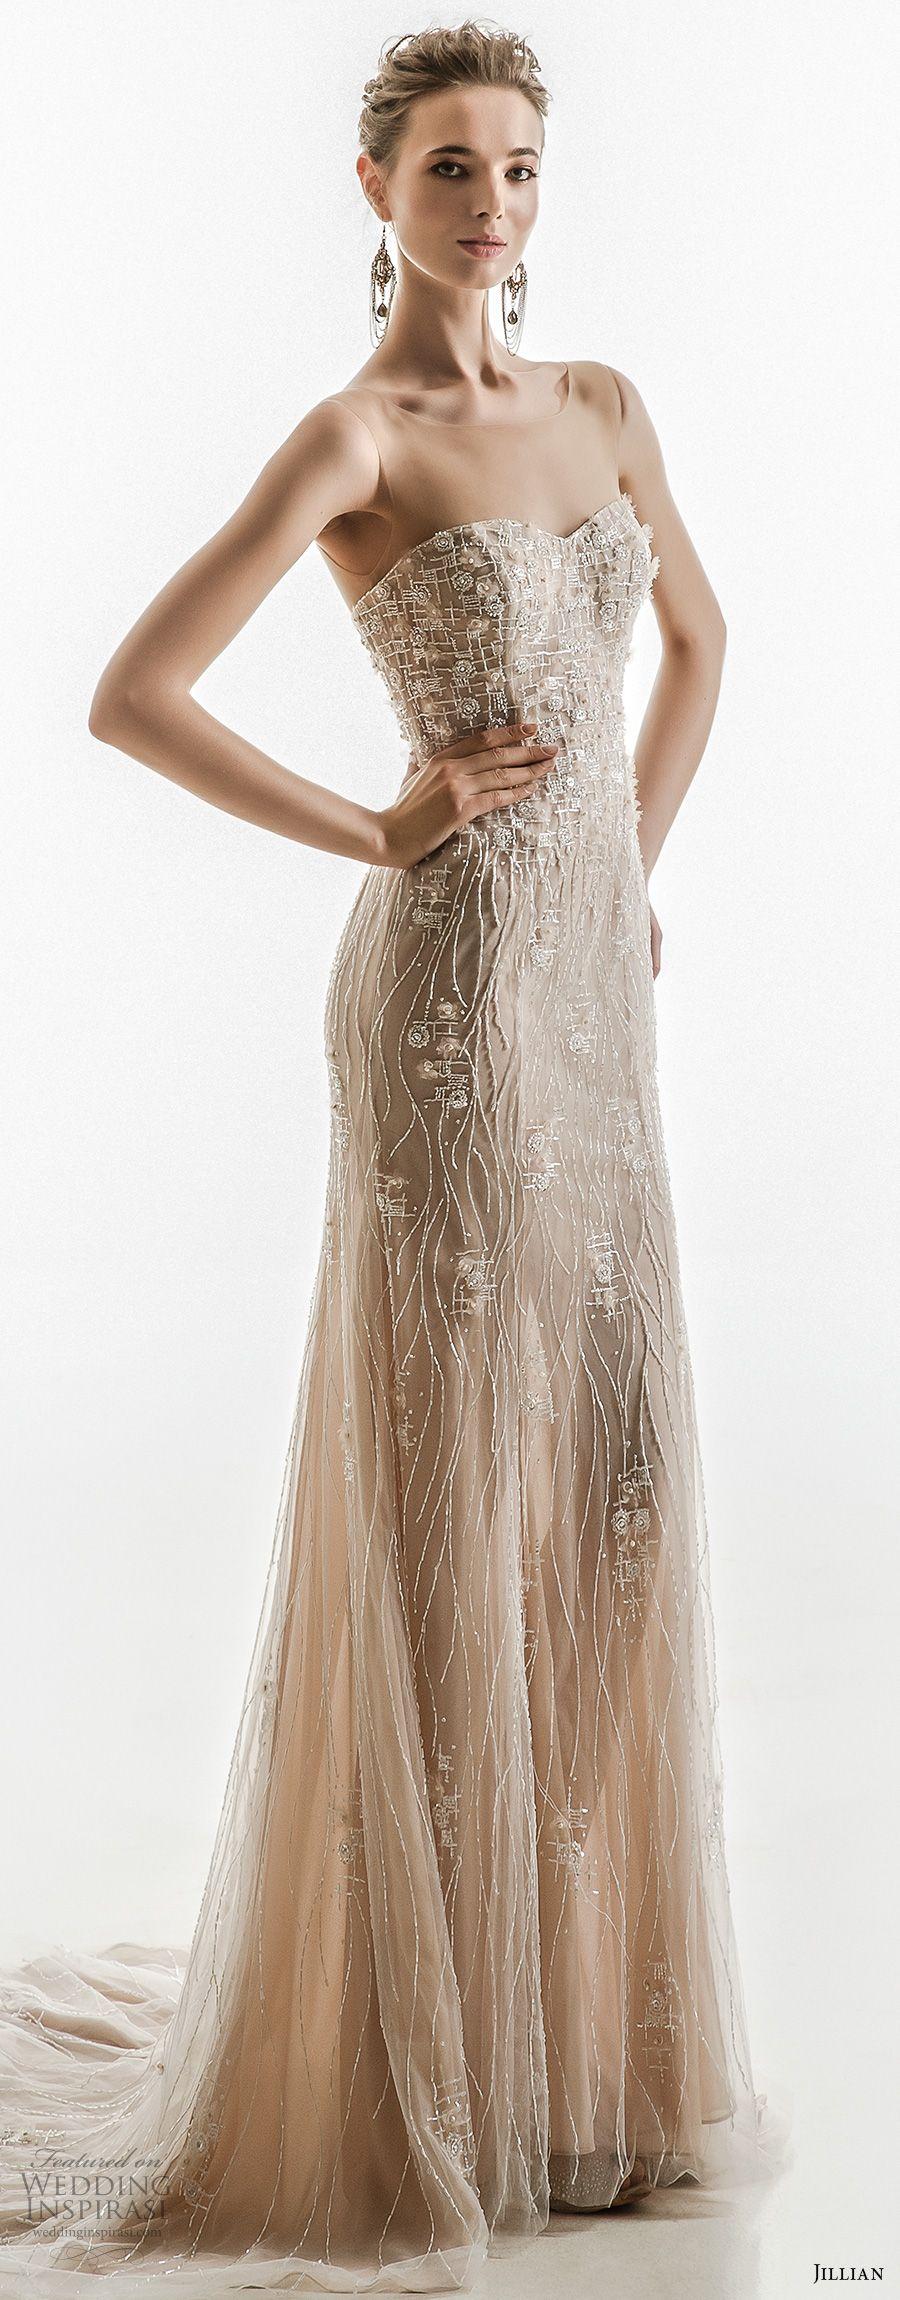 Jillian 2018 Wedding Dresses | Pinterest | Champagne colour ...